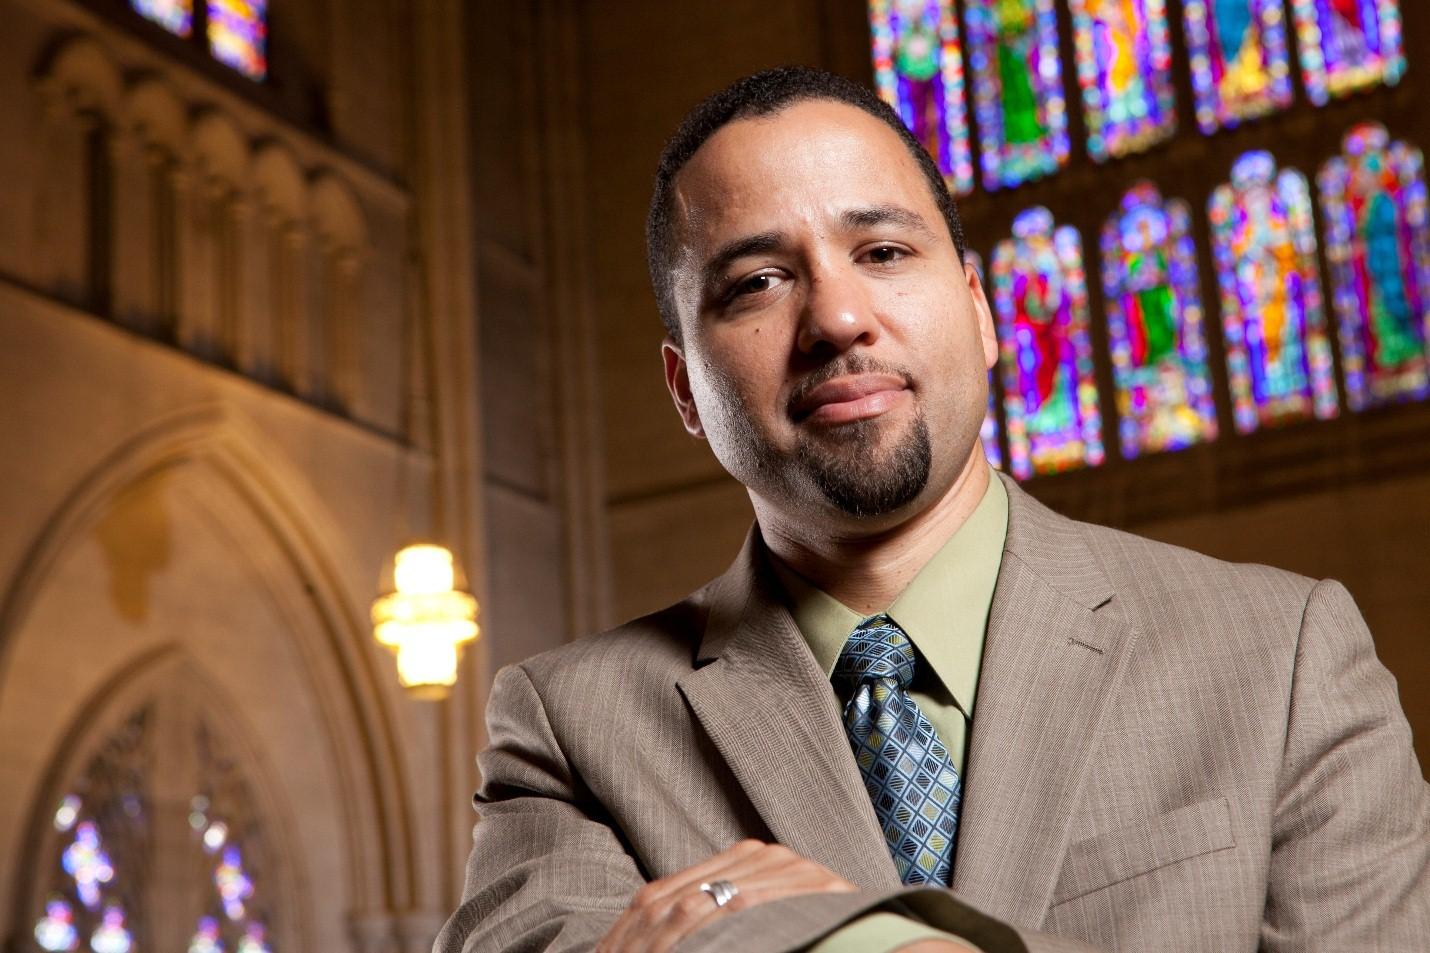 Rev. Dr. Luke Powery